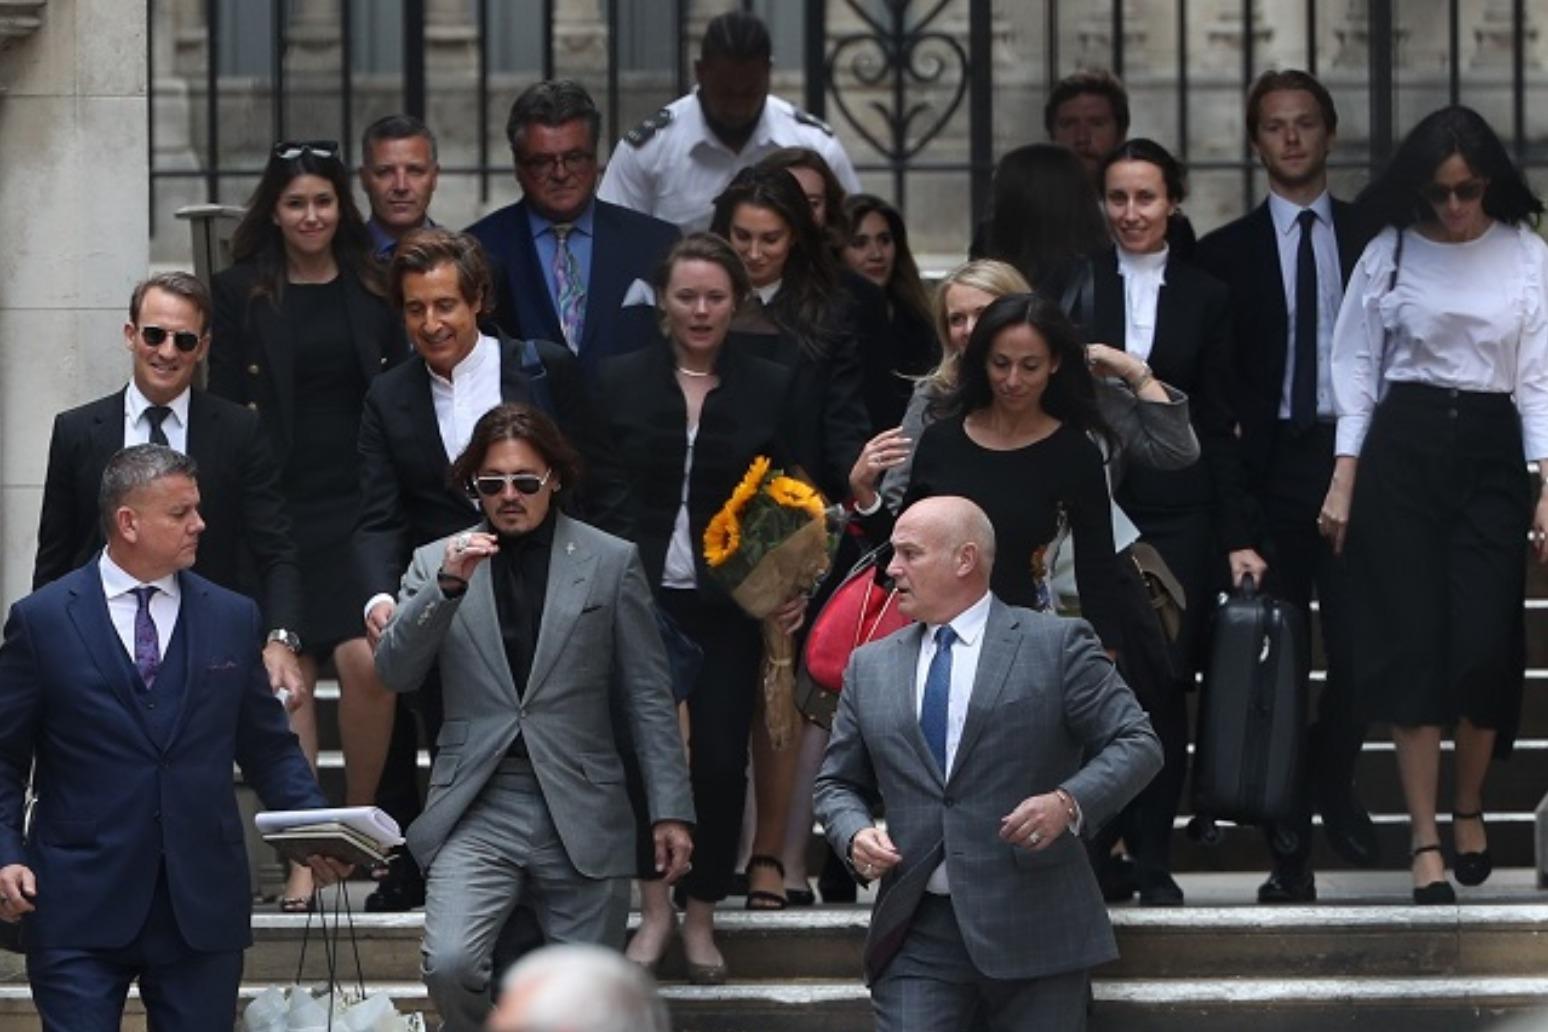 Johnny Depp Libel Case Verdict Due In September Spire Radio Derbyshire S Heartbeat